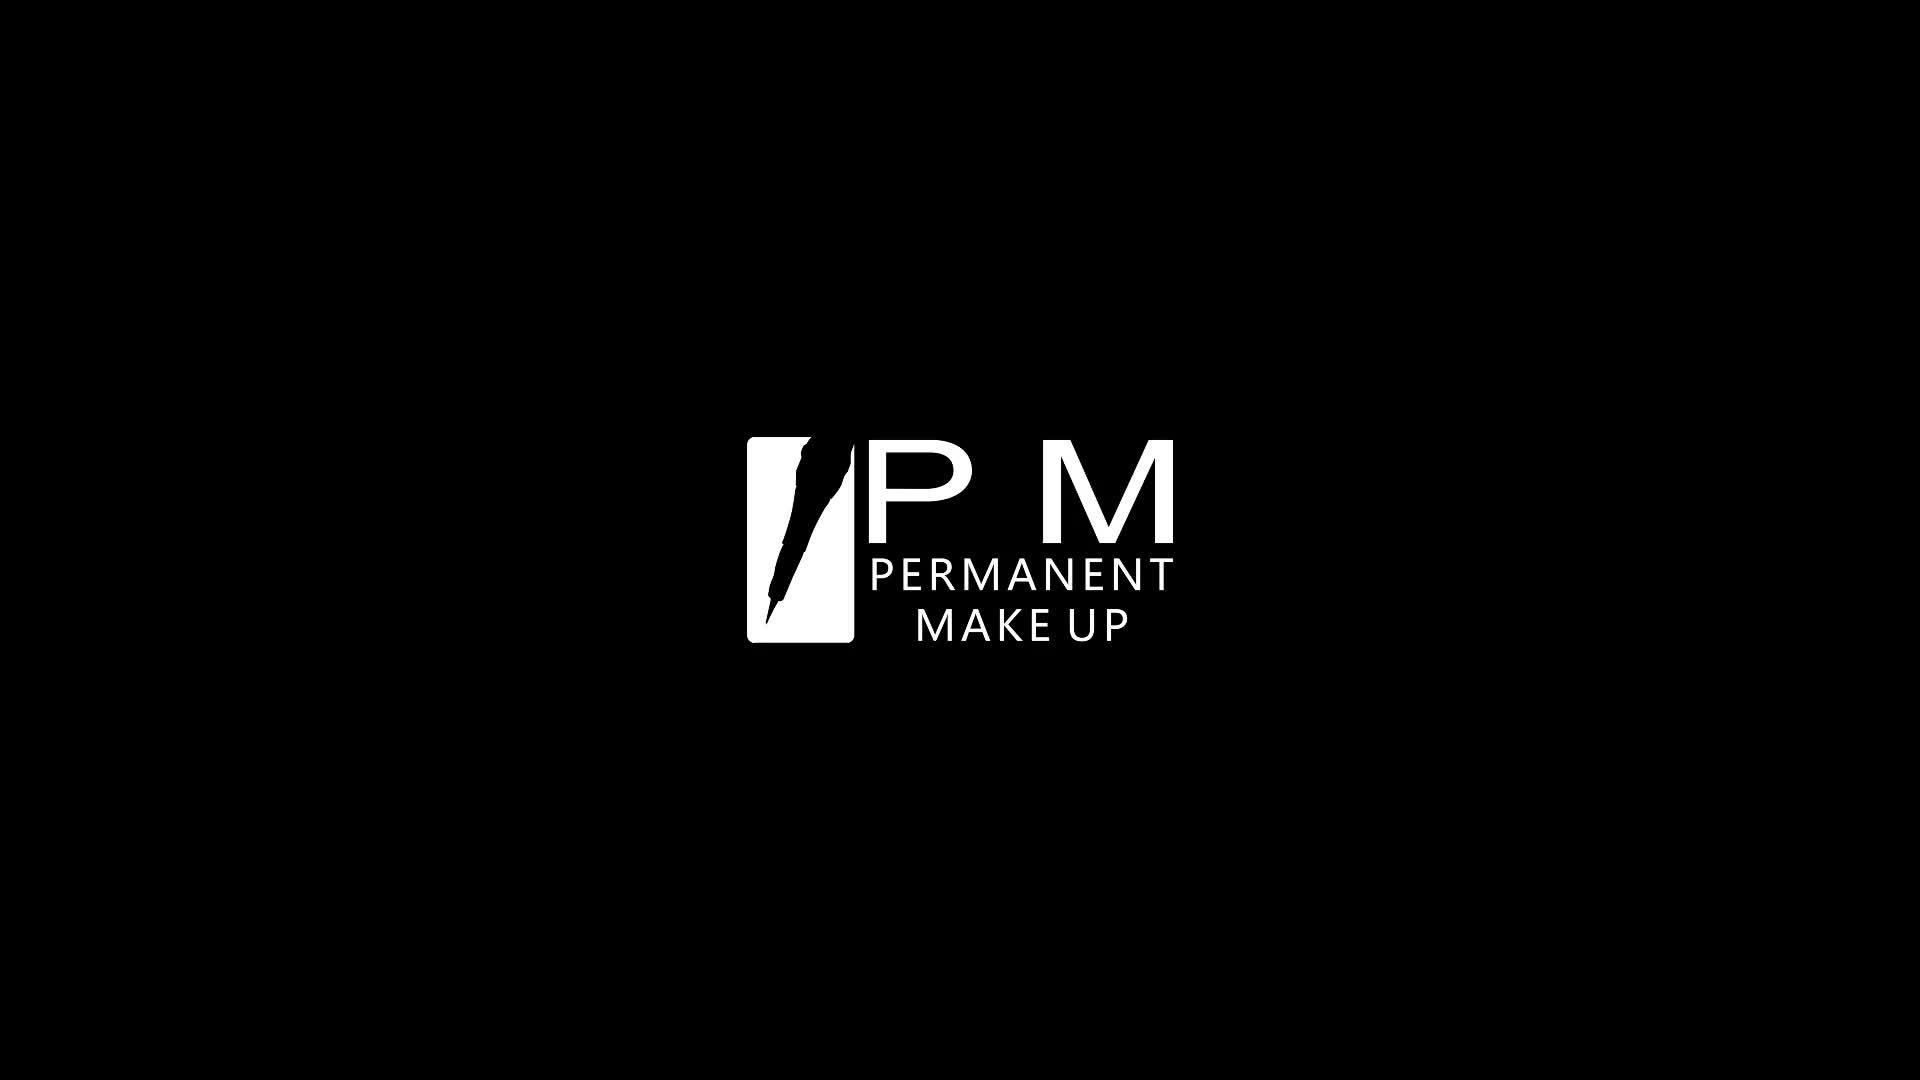 GOOCHI PM Permanent Make-Up Pigmente Für Augenbraue Lip Mikropigmentation